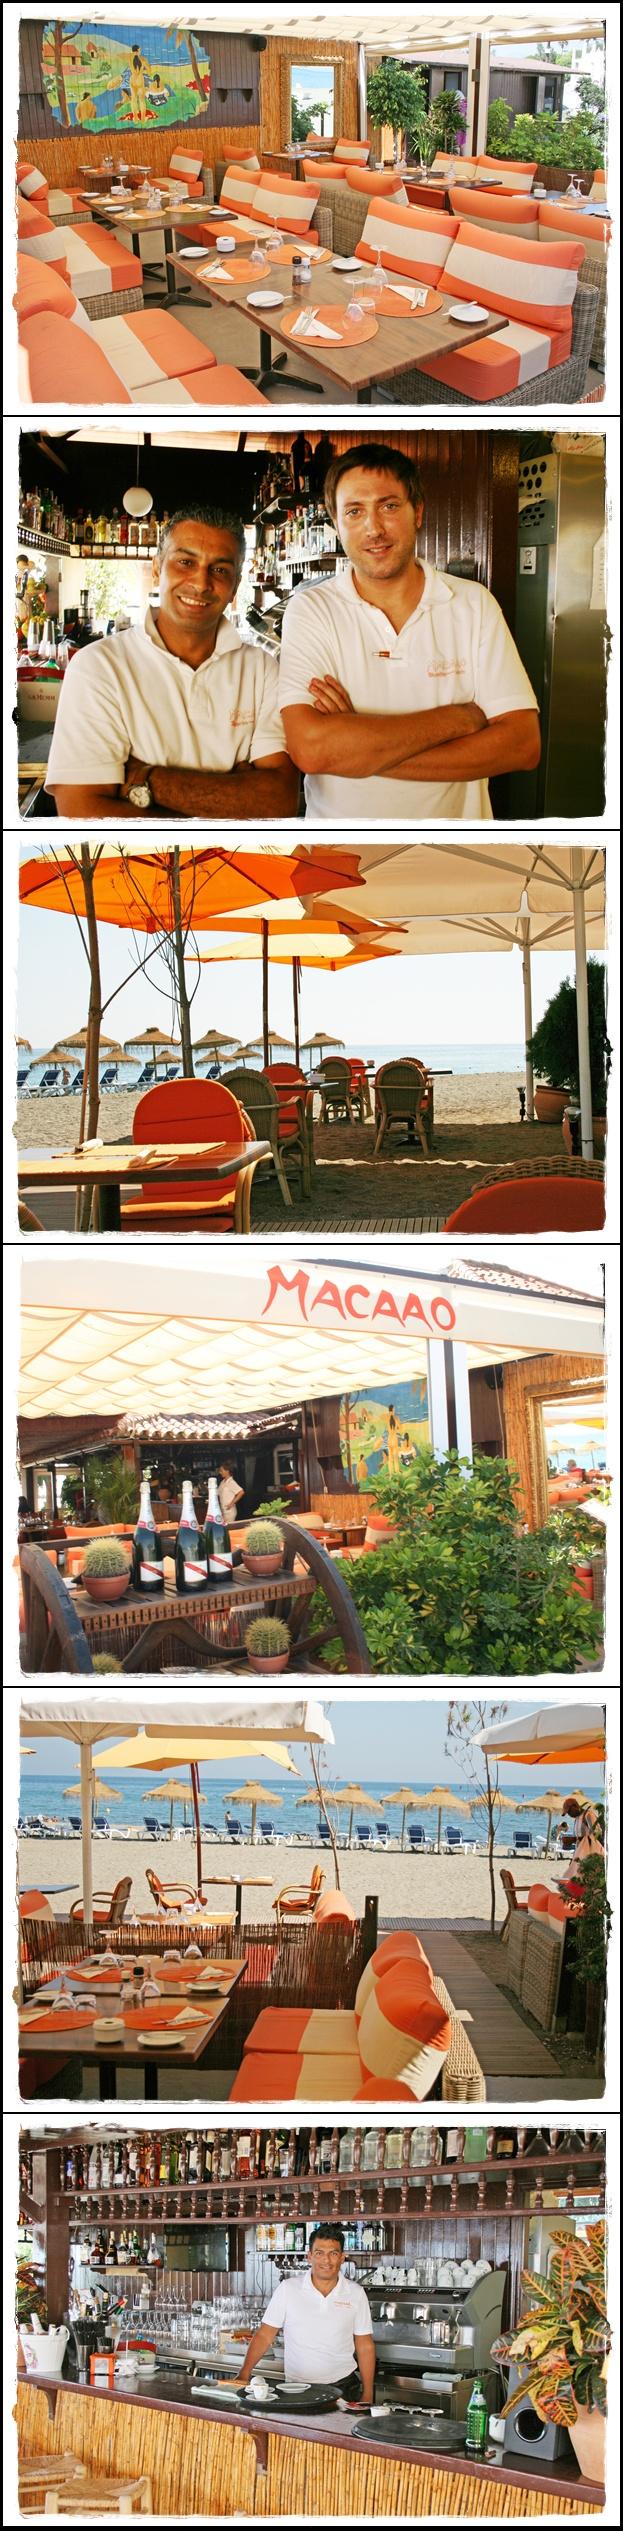 Macaao Beach Club